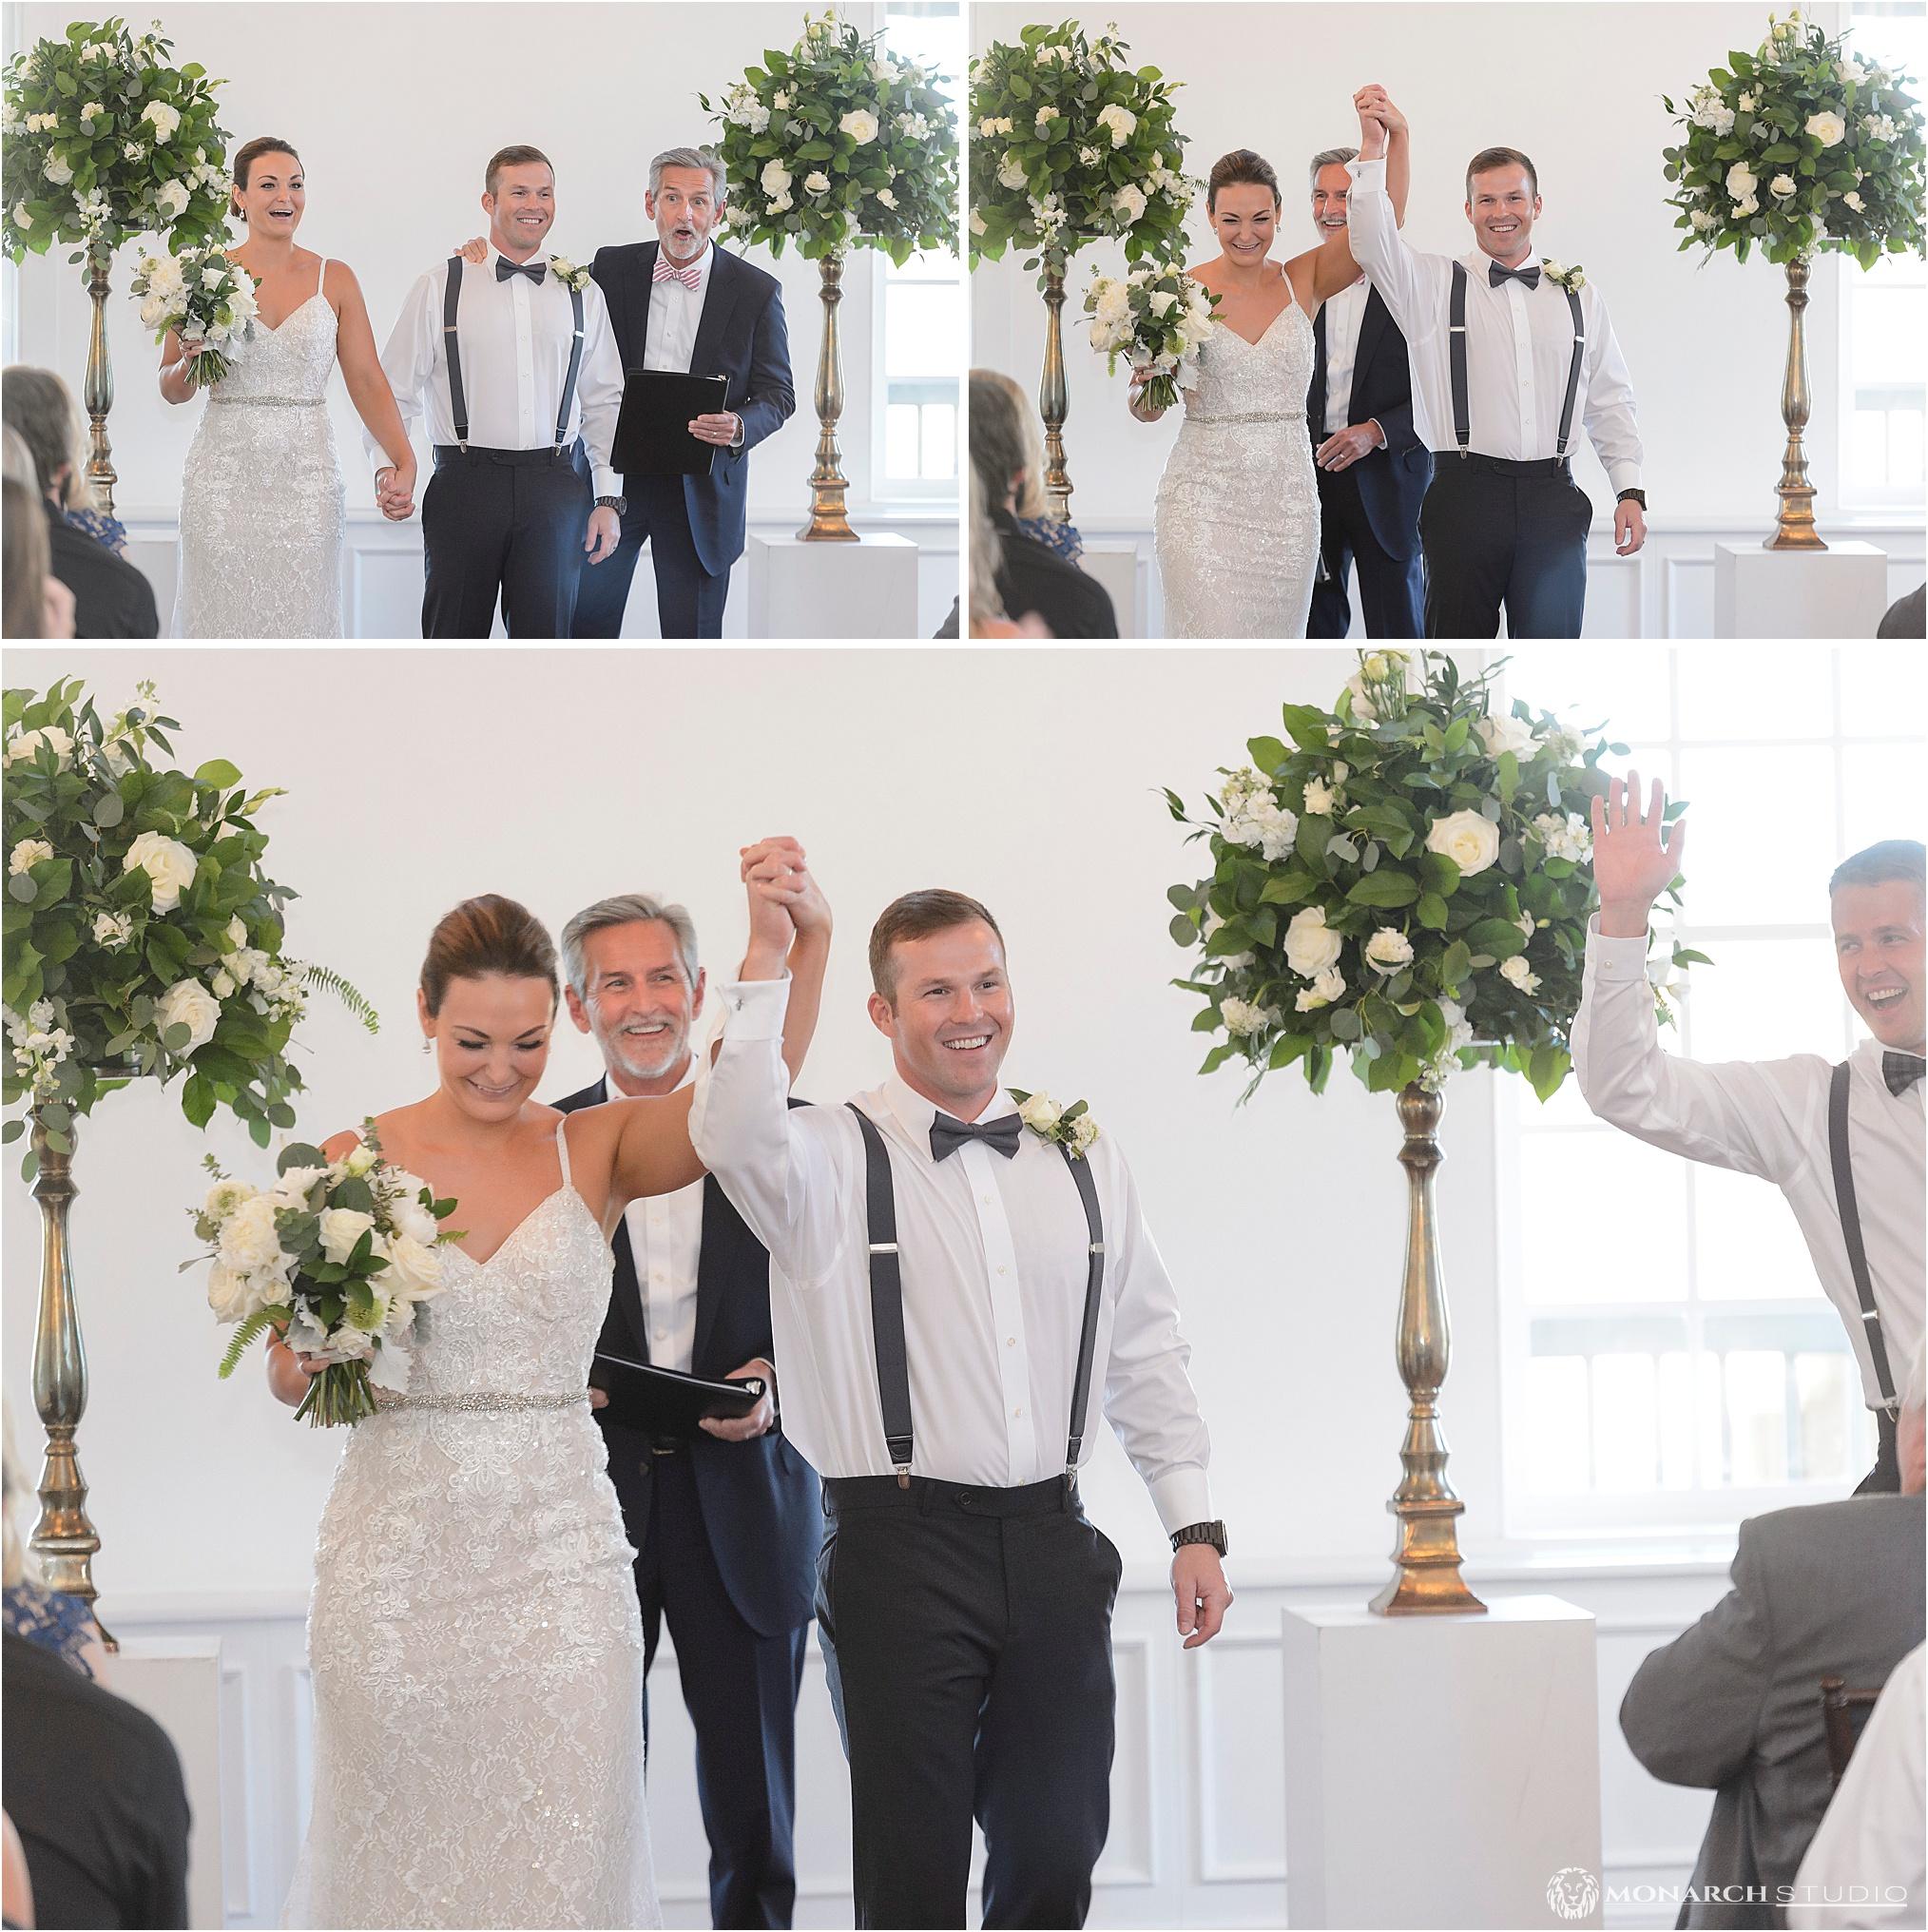 078-whiteroom-wedding-photographer-2019-05-22_0060.jpg